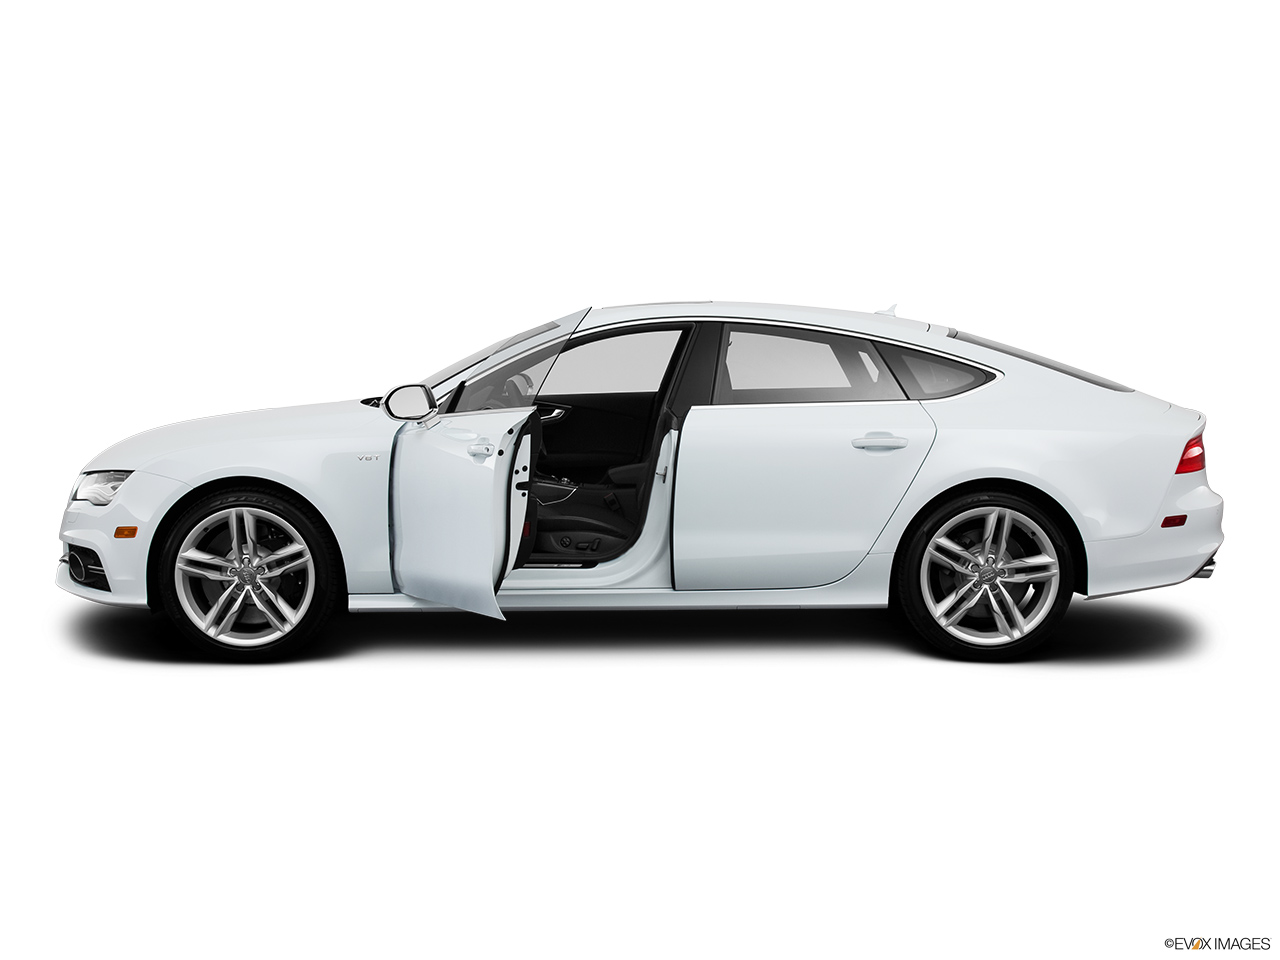 Stjpg - Audi car 7